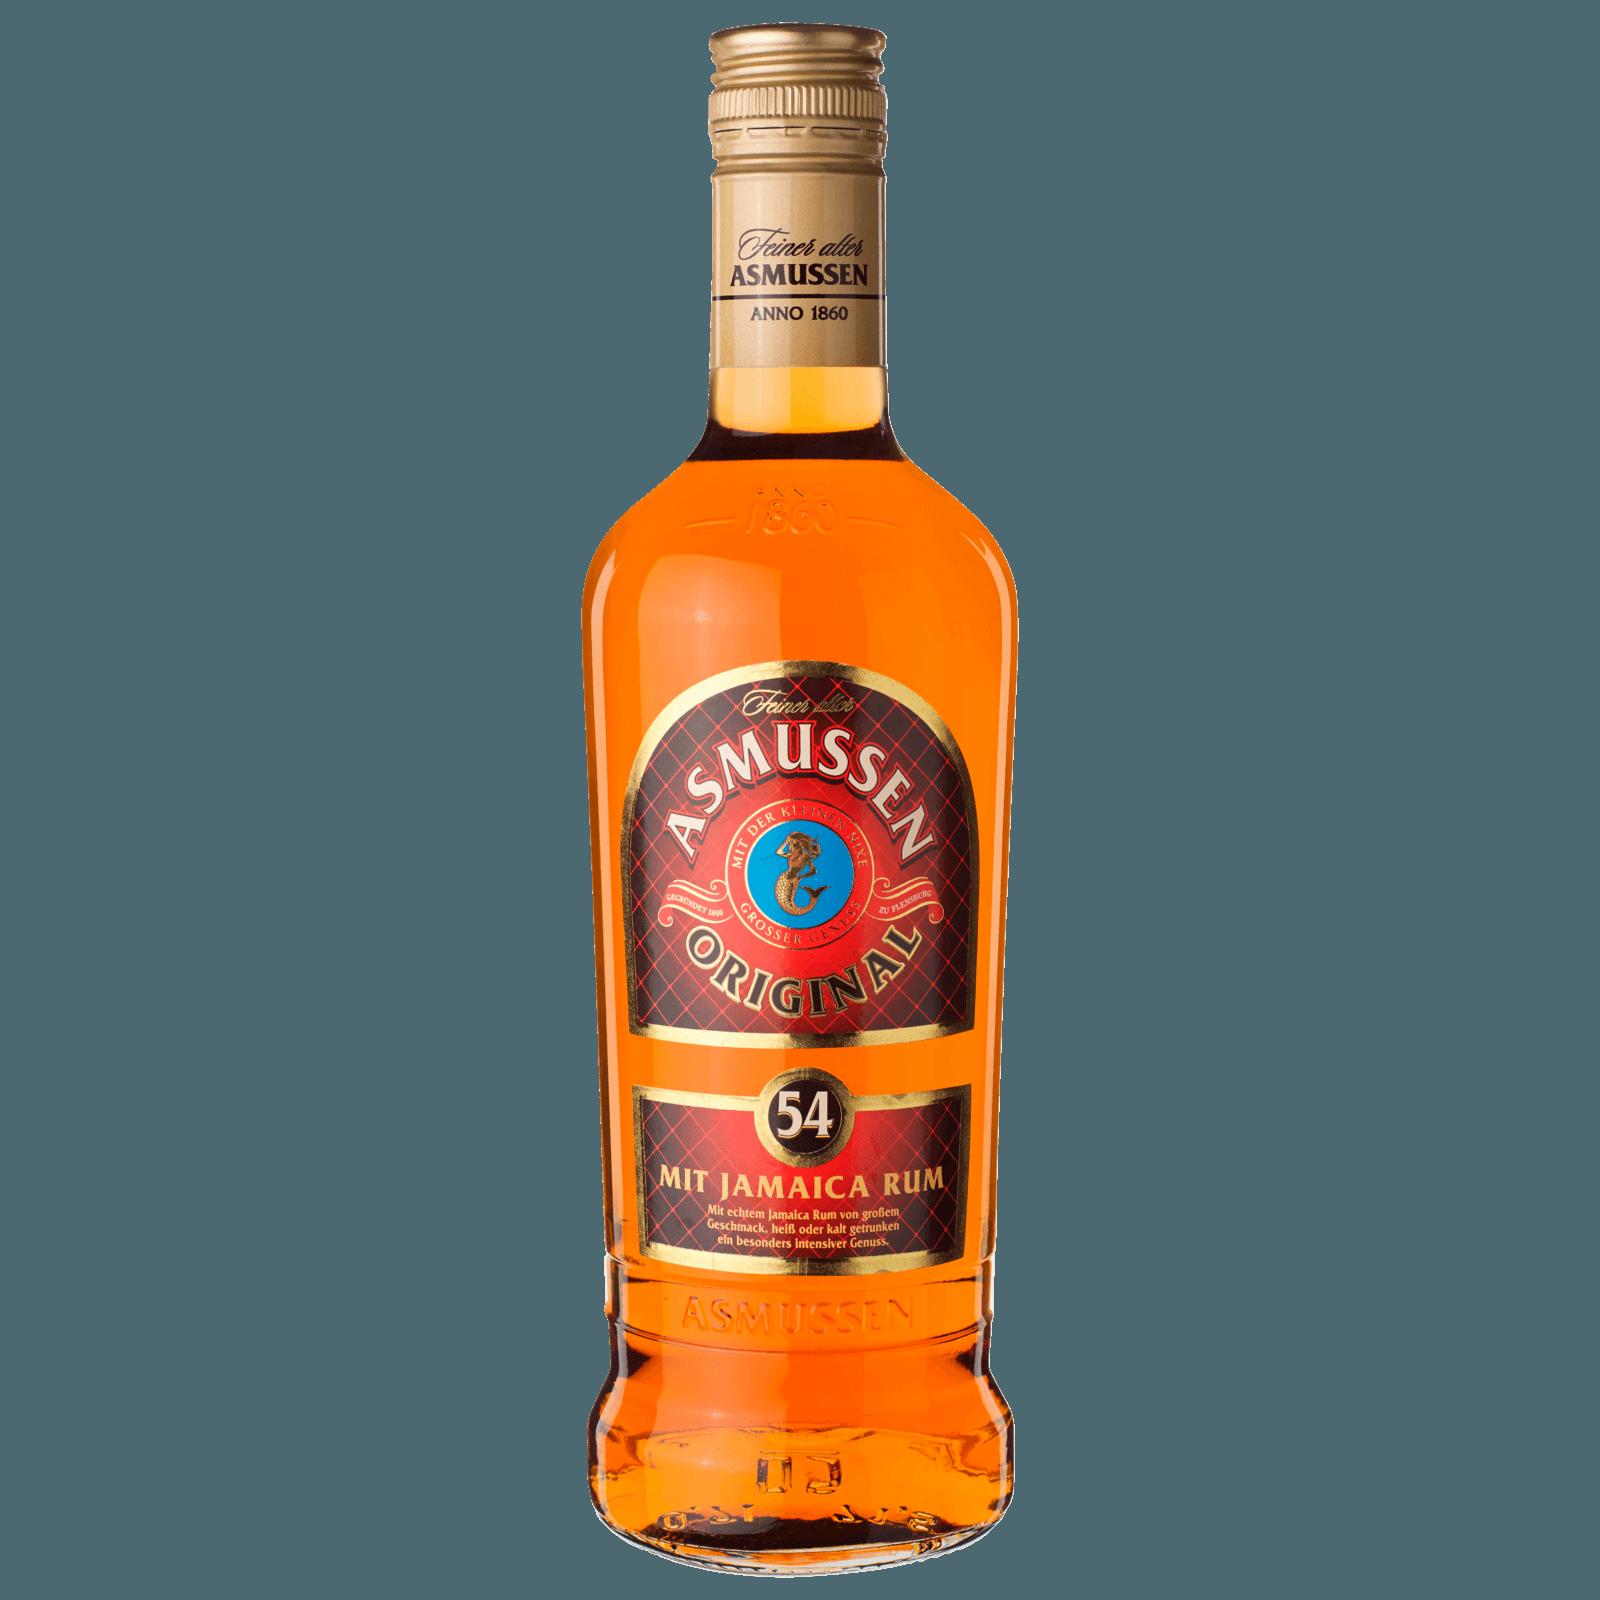 Asmussen Jamaica Rum 0,7l bei REWE online bestellen!